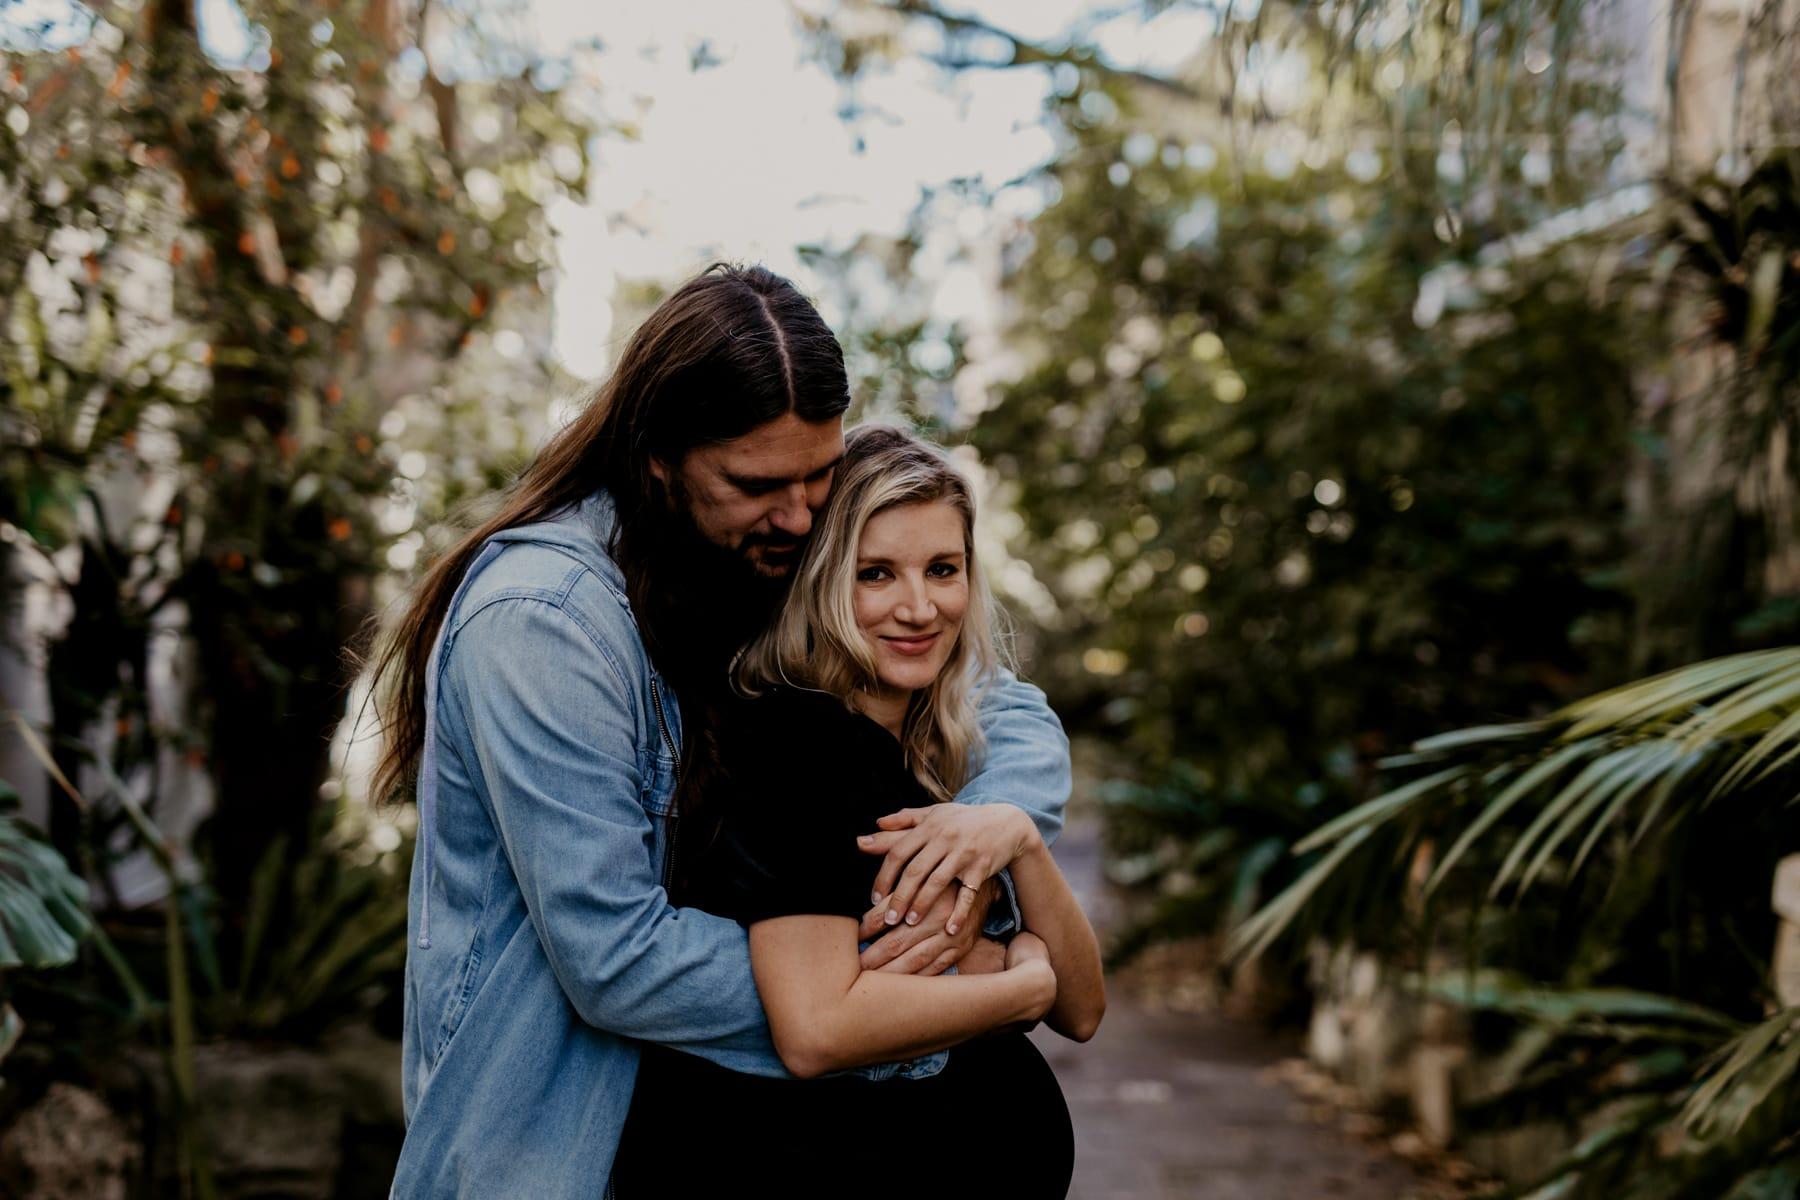 maternity-maternityphotography-lovers-sutherlandshirematernityphotographyer-sydneymaternityphotographer-babybump0004